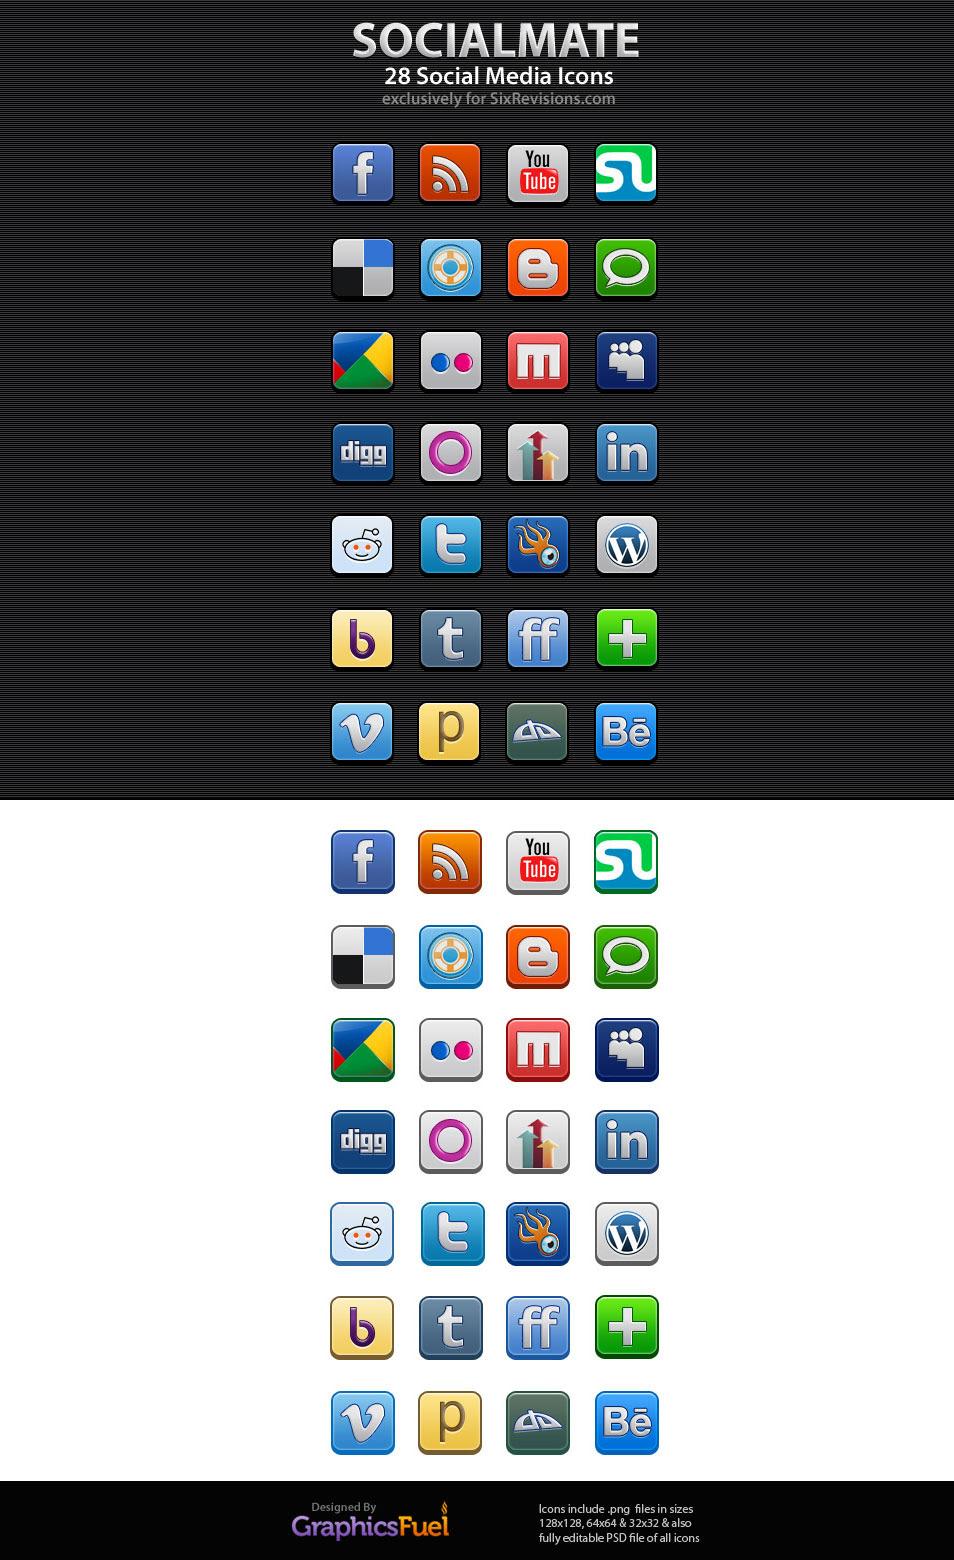 SocialMate: 28 Free Social Media Icons